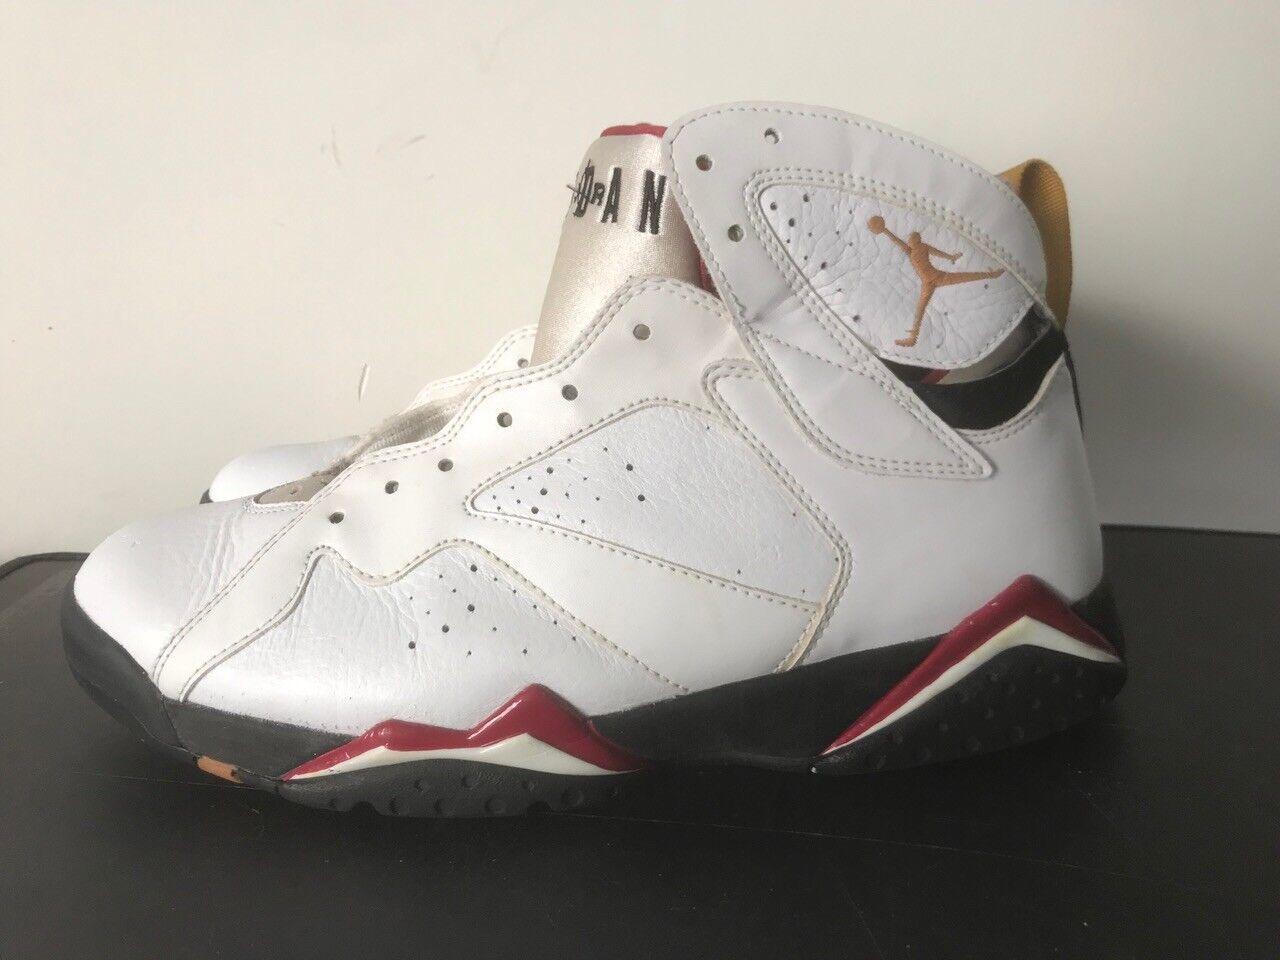 2011 Nike Air Jordan Vii Retro '7 3 Cardinalsize 10,5 Bronzo Red Raptor Og 4 1 3 '7 11 197a6b